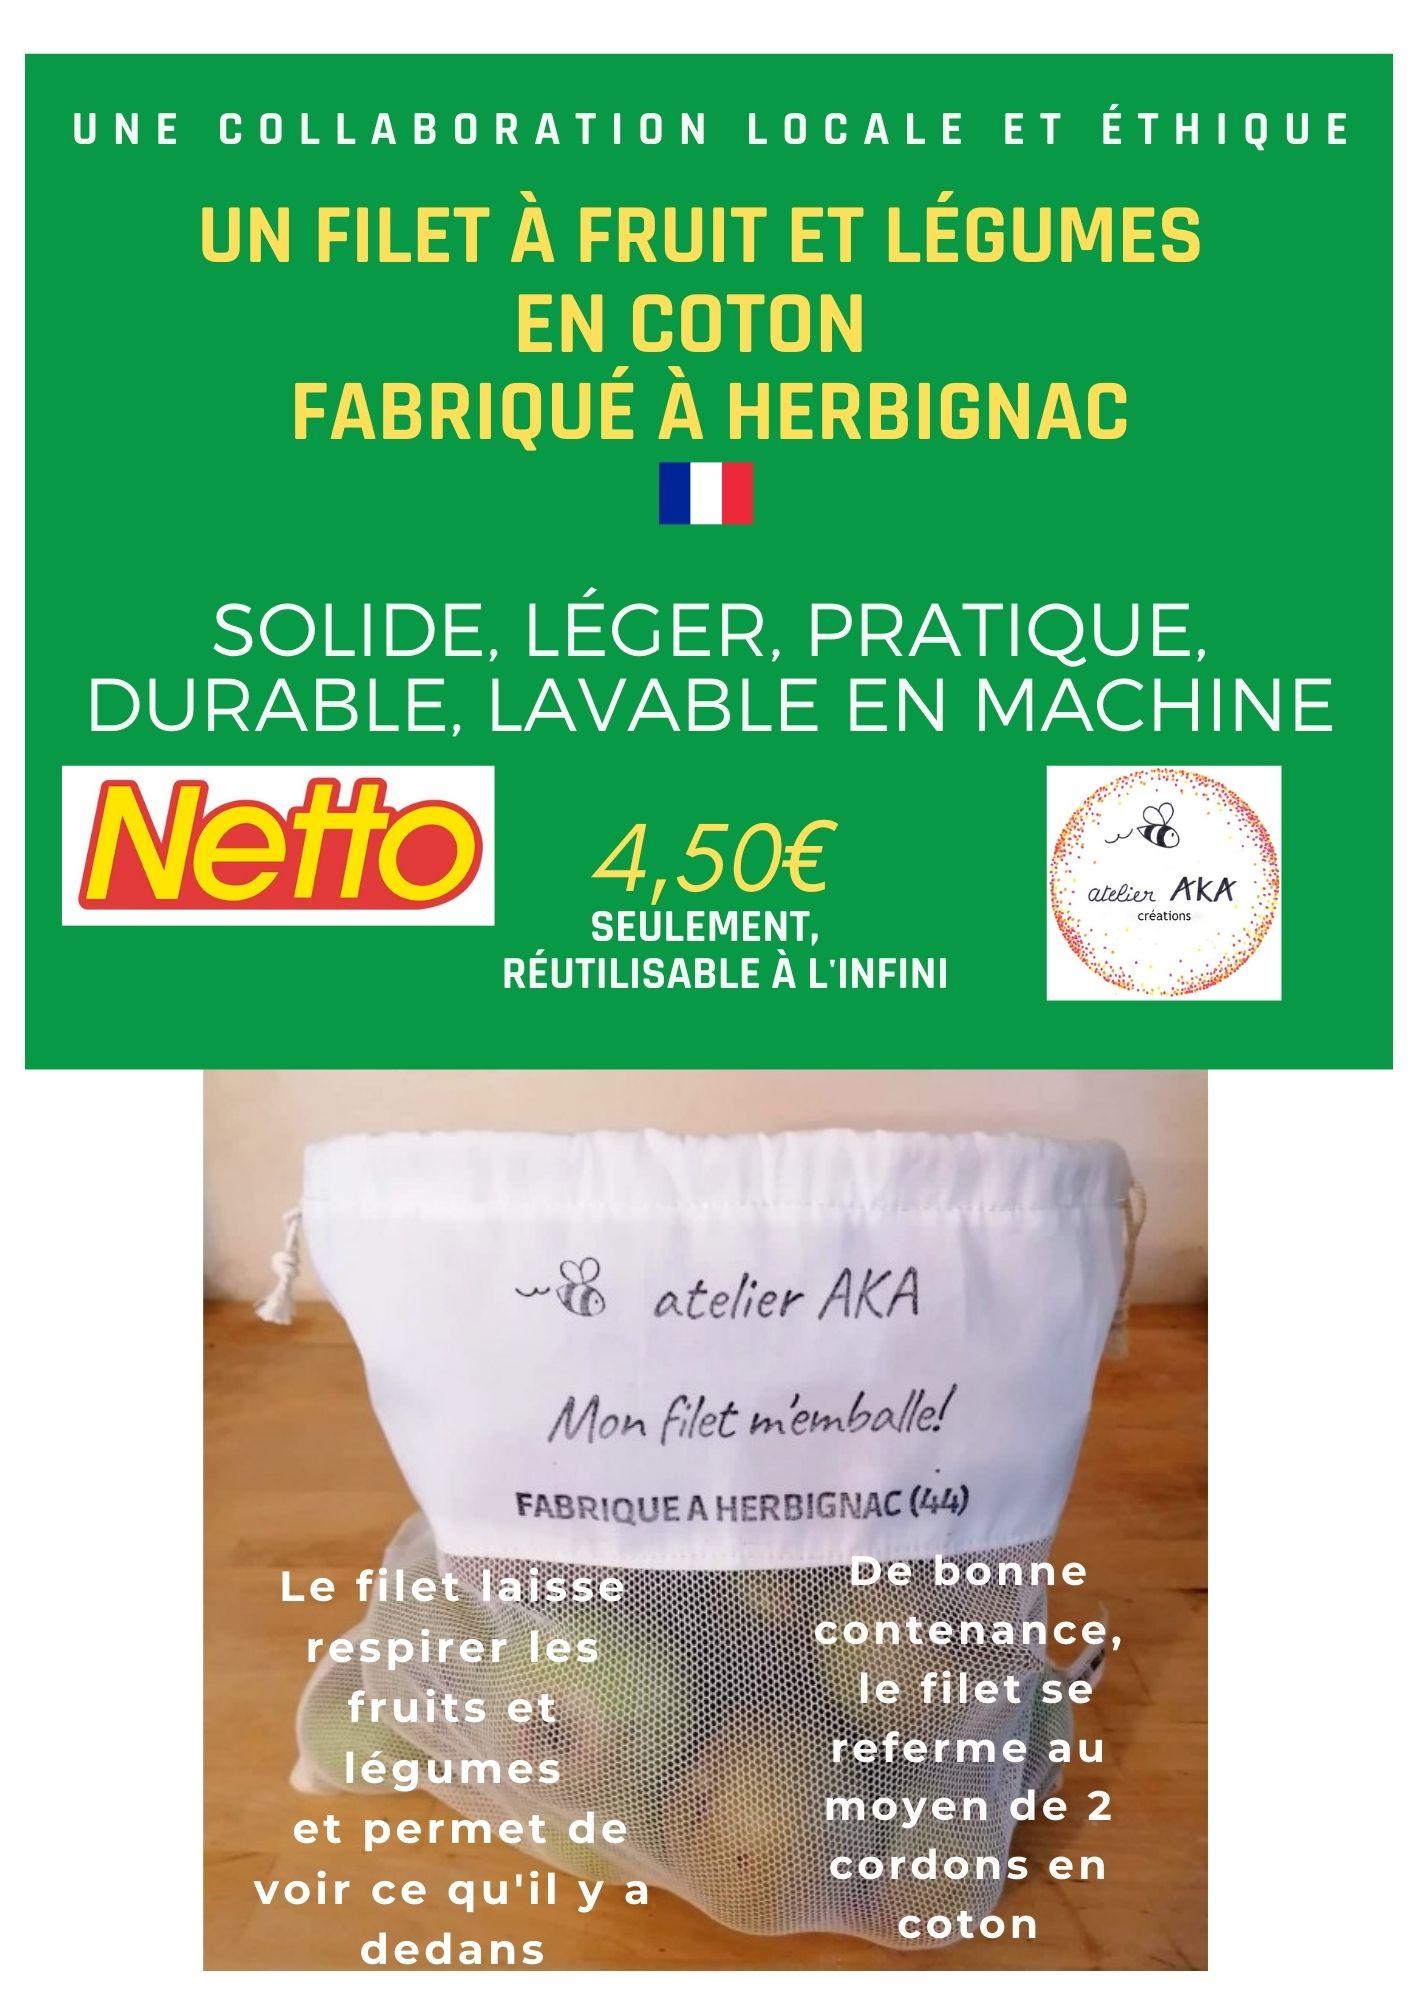 #monfilet m'emballe et Netto